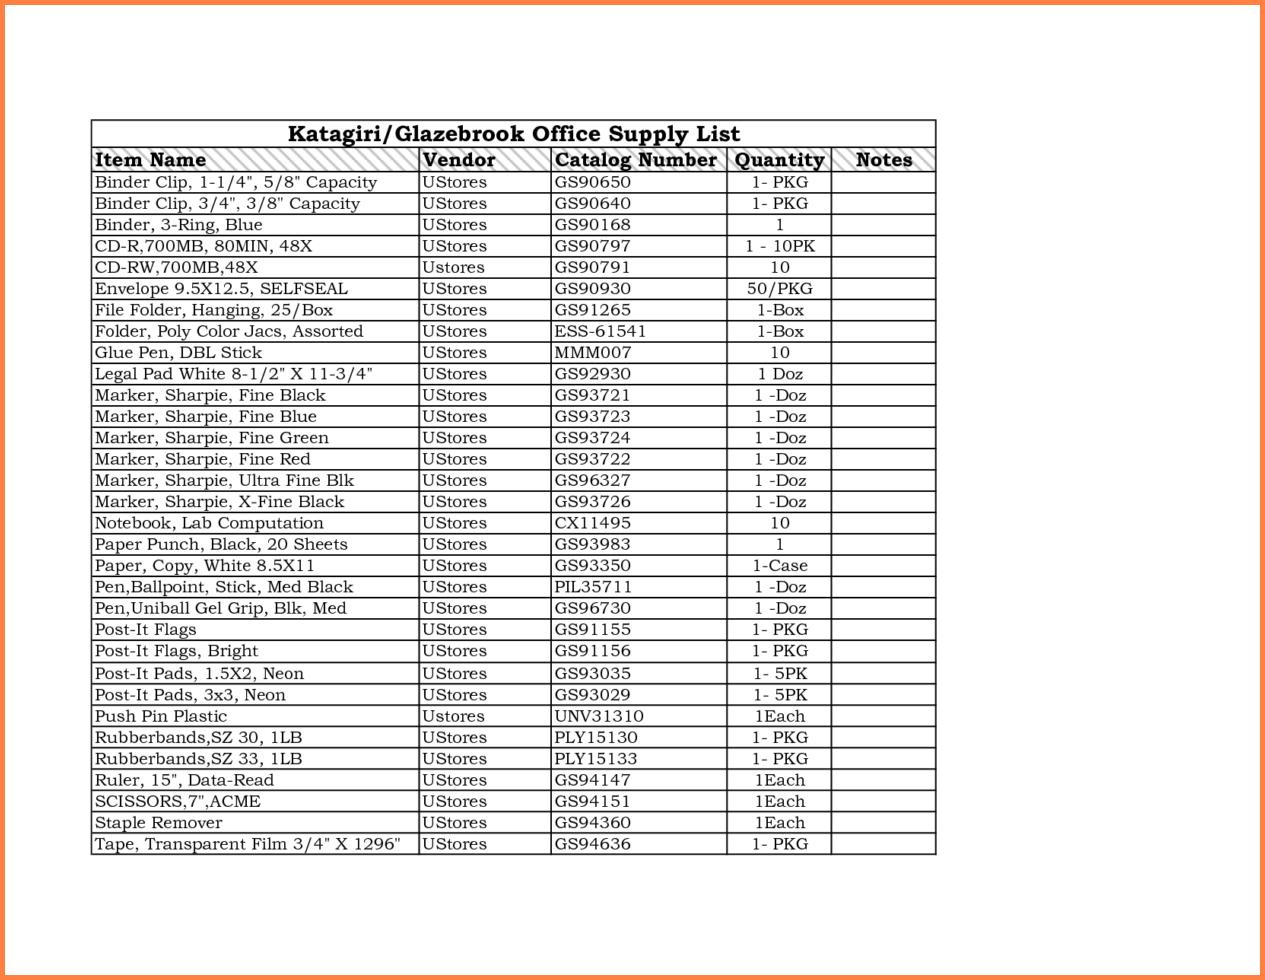 Office Supply Inventory Spreadsheet Inside Office Supplies Inventory Spreadsheet Example Of Furniture Medical